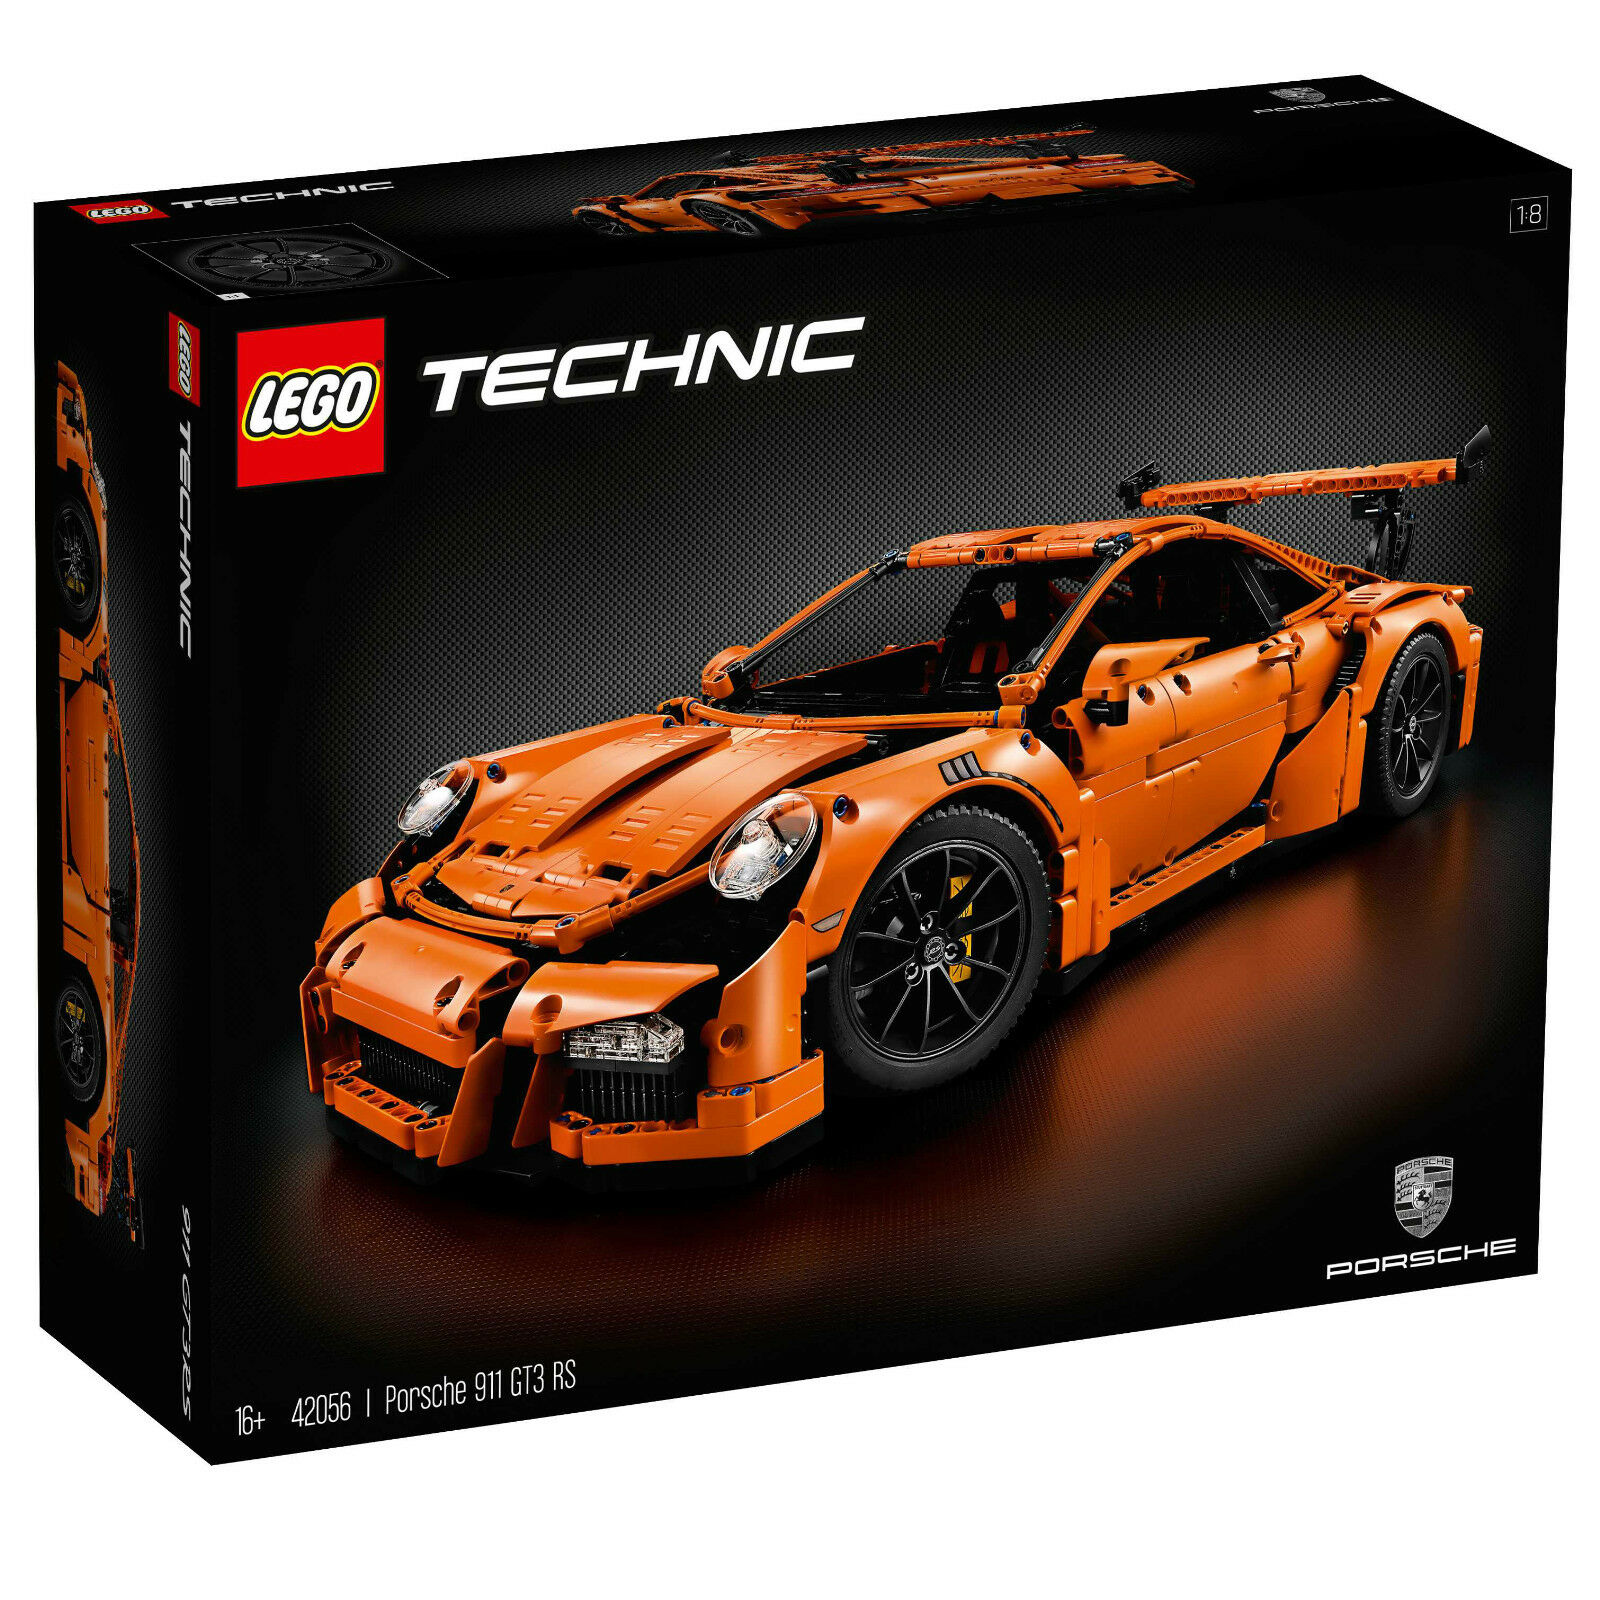 LEGO LEGO LEGO Technic Porsche 911 GT3 RS 42056 model sports car building kit set technics ecaf5a